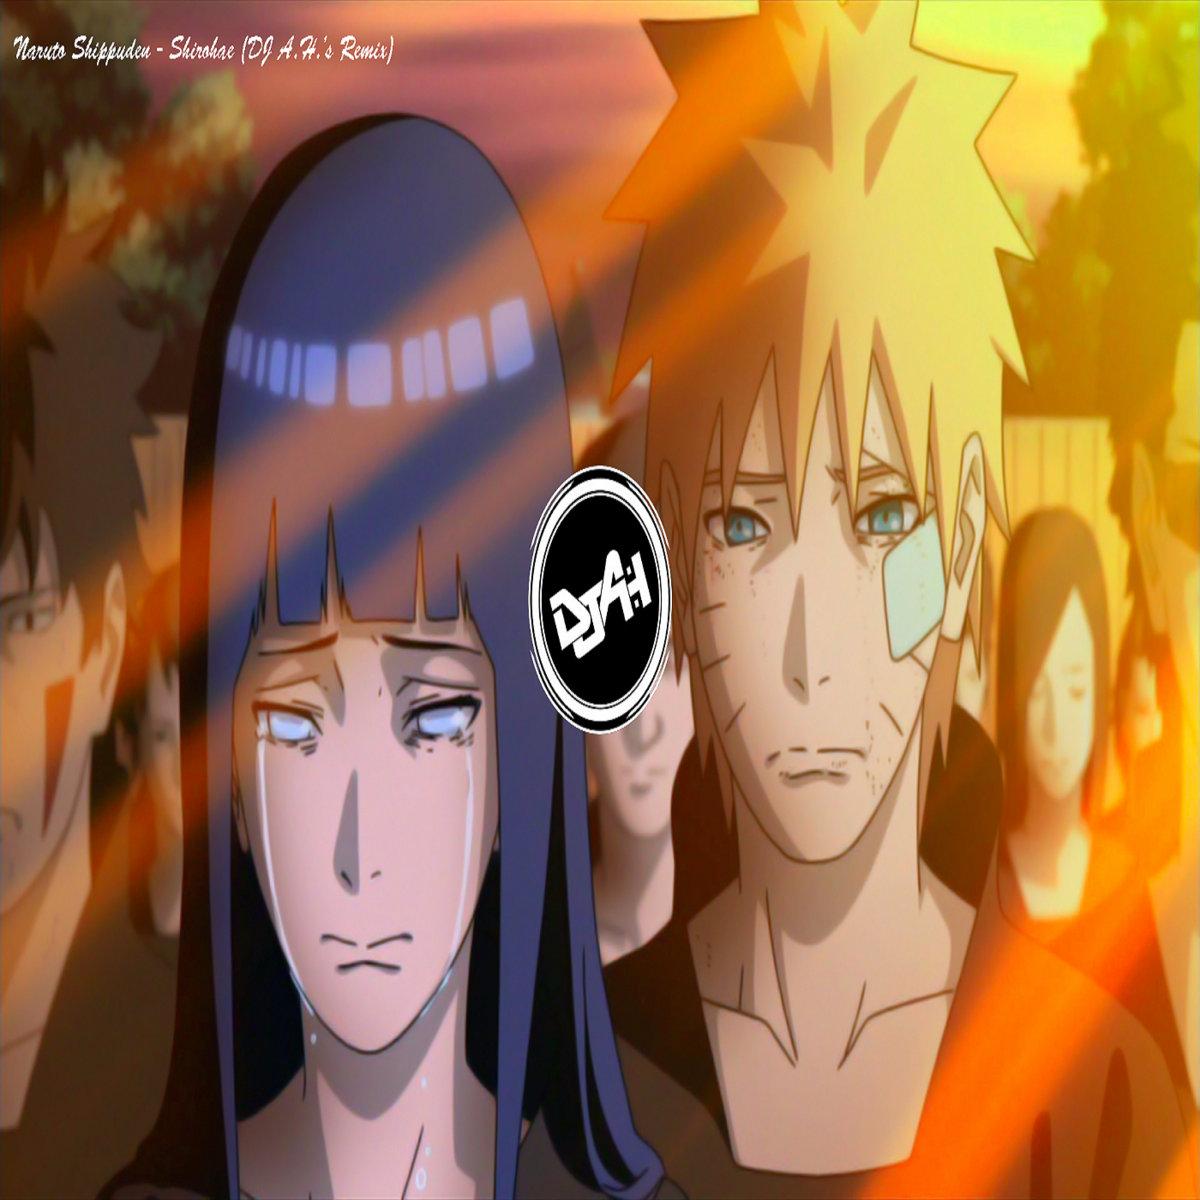 Naruto Shippuden - Shirohae (DJ A H 's Remix) | DJ A H